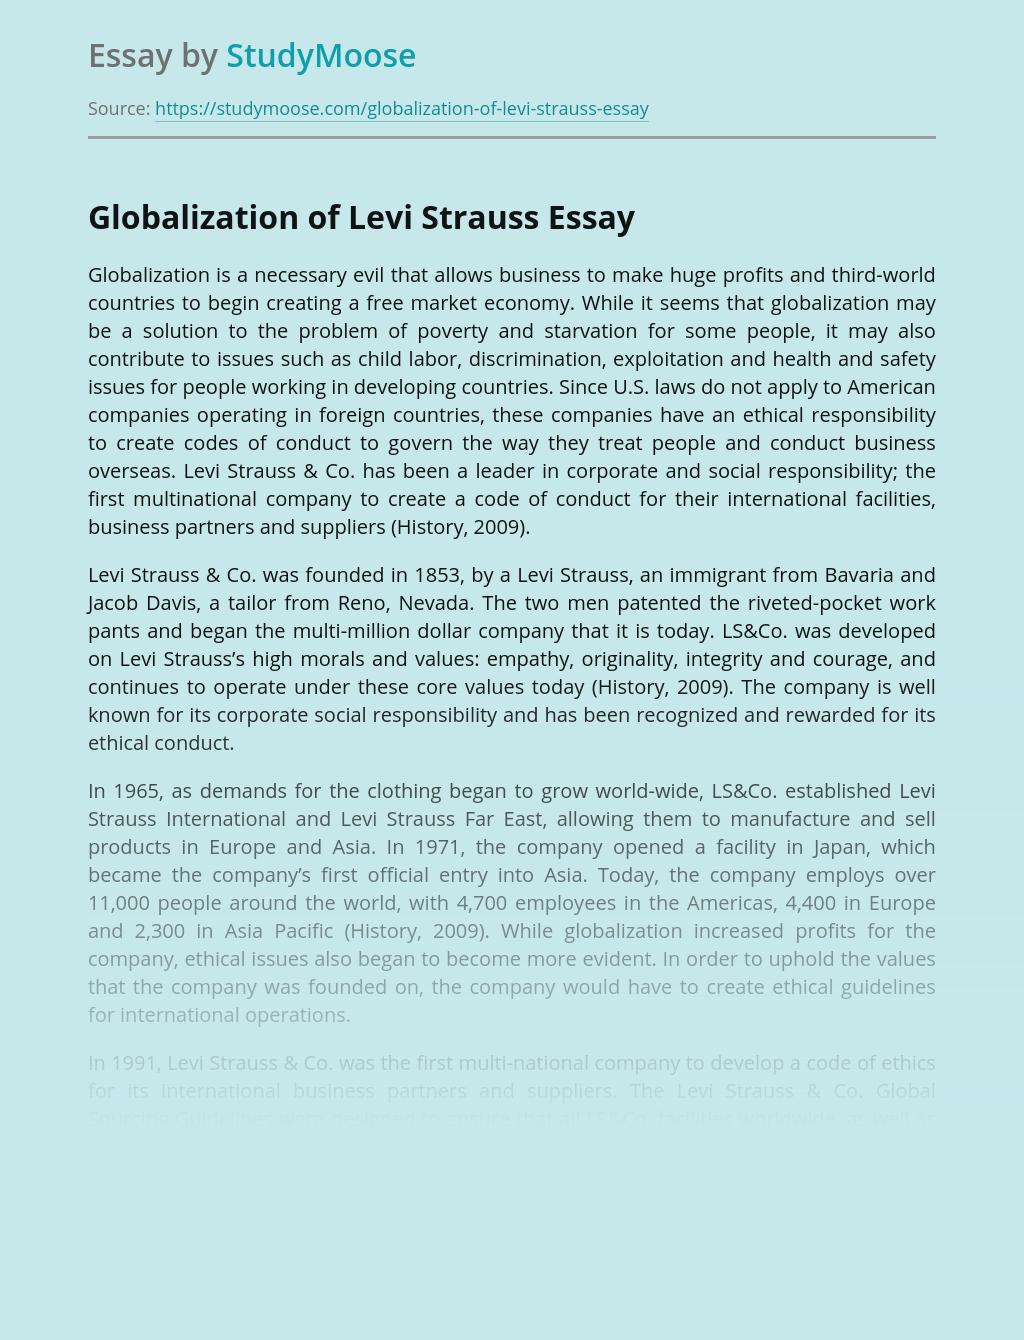 Globalization of Levi Strauss